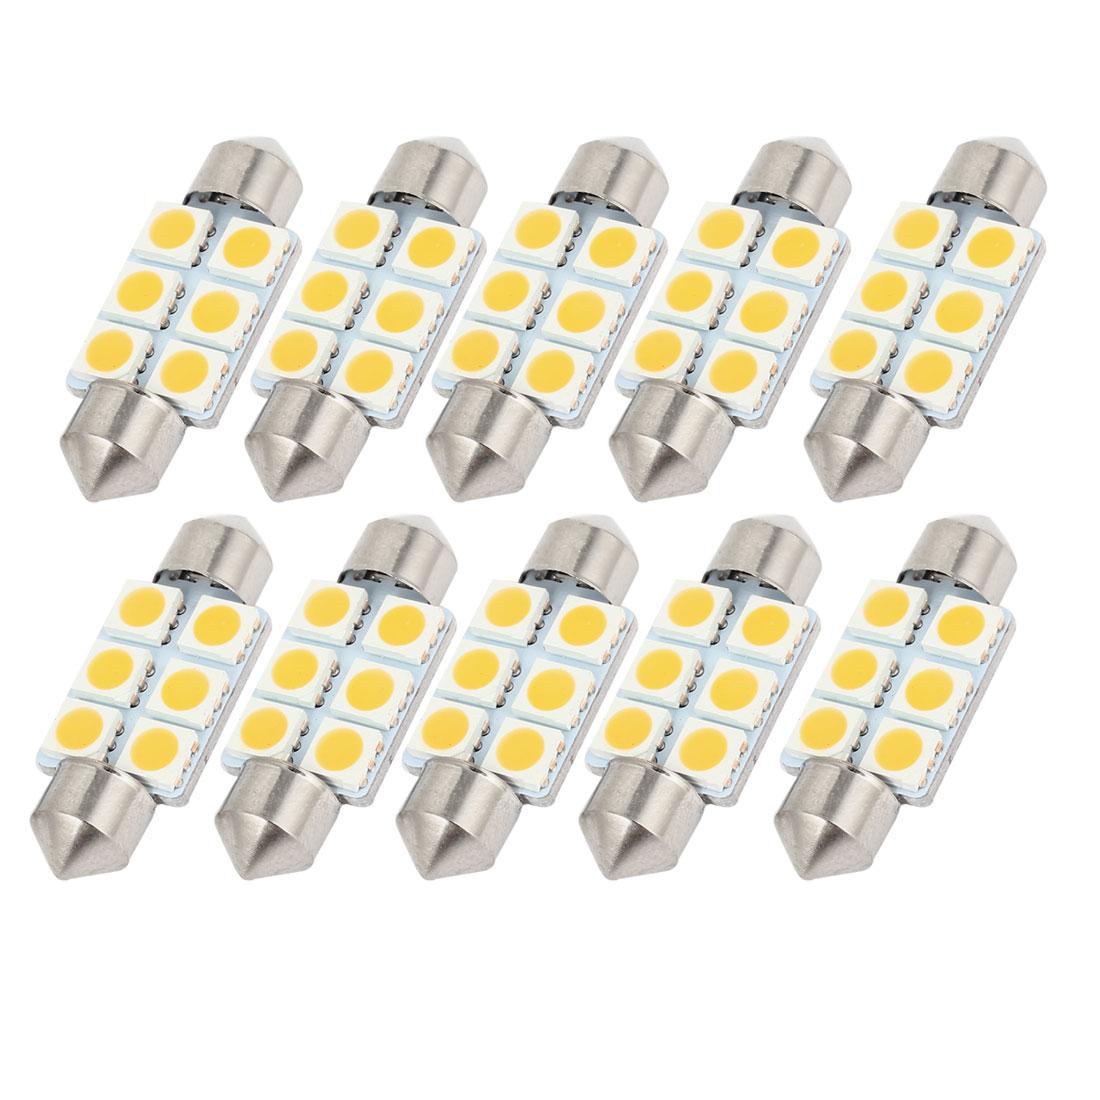 "10PCS 36mm 1.5"" 6-SMD 5050 Warm White LED Festoon Dome Light DE3425 Internal"